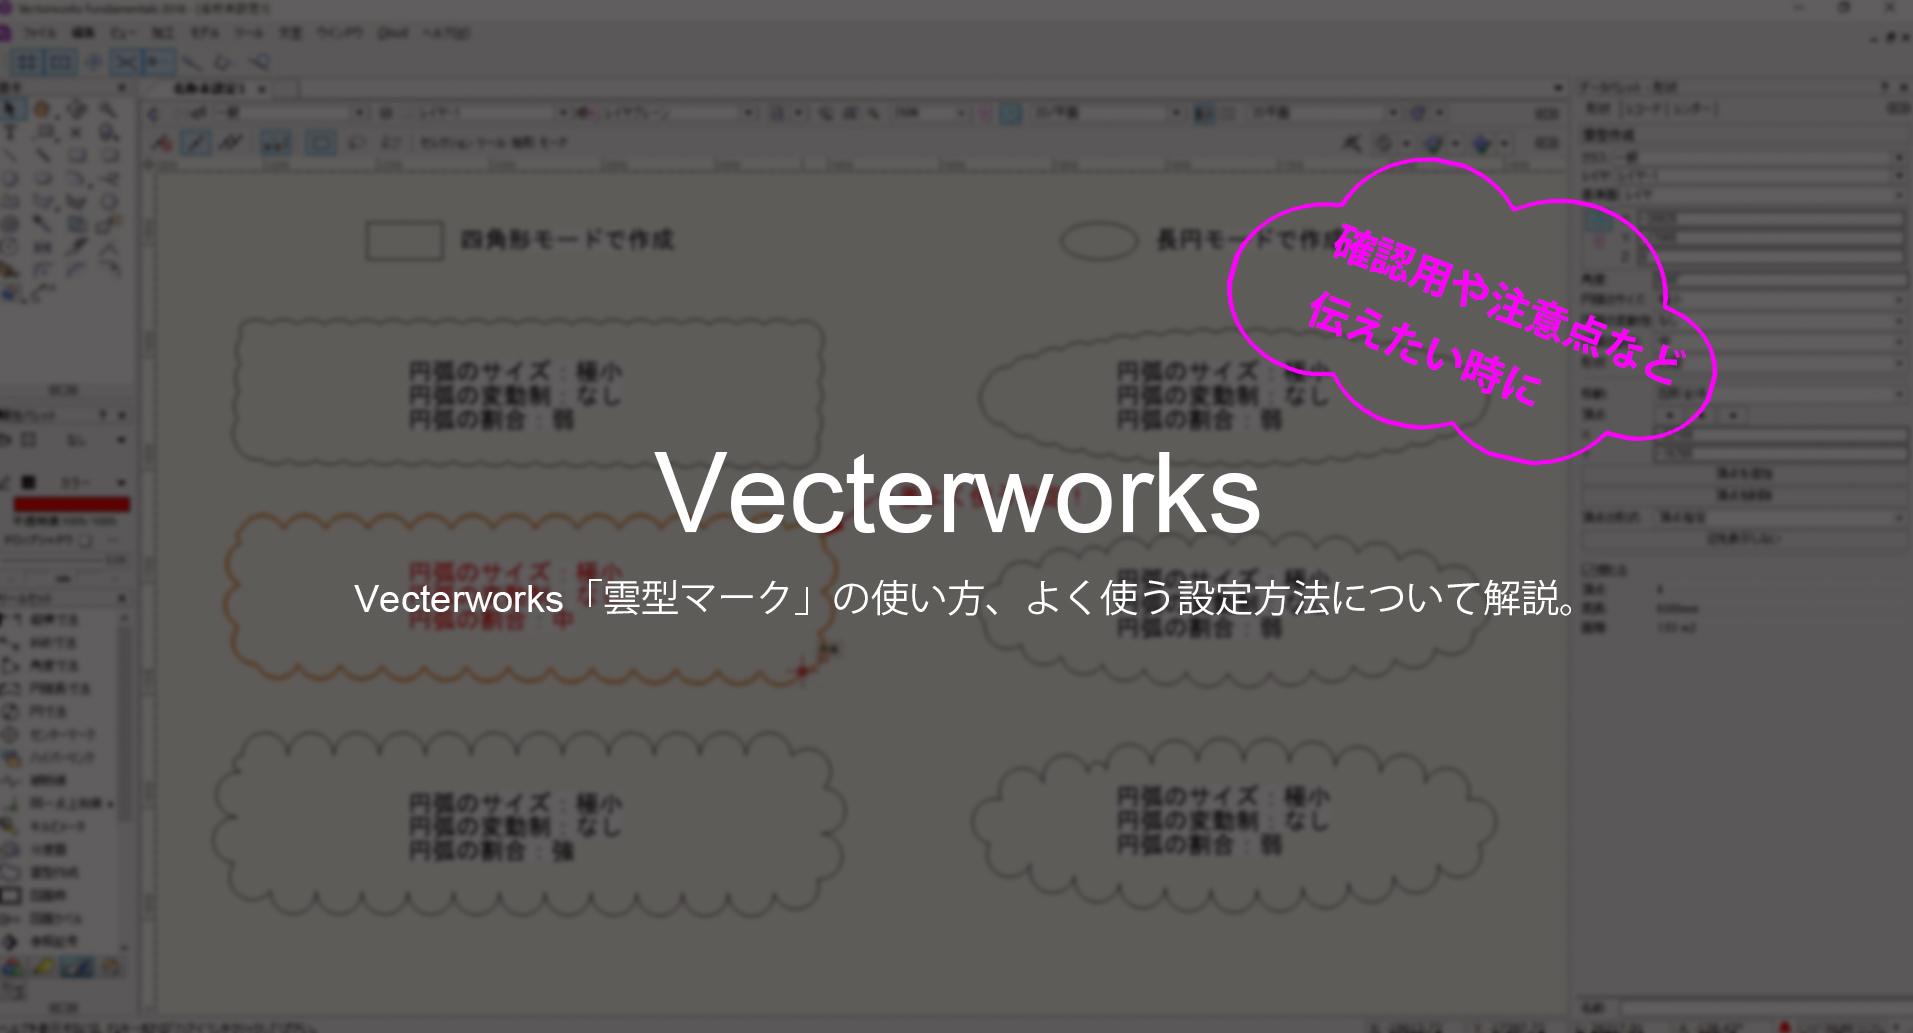 Vectorworksの「雲型マーク」の使い方、よく使う設定方法について解説。